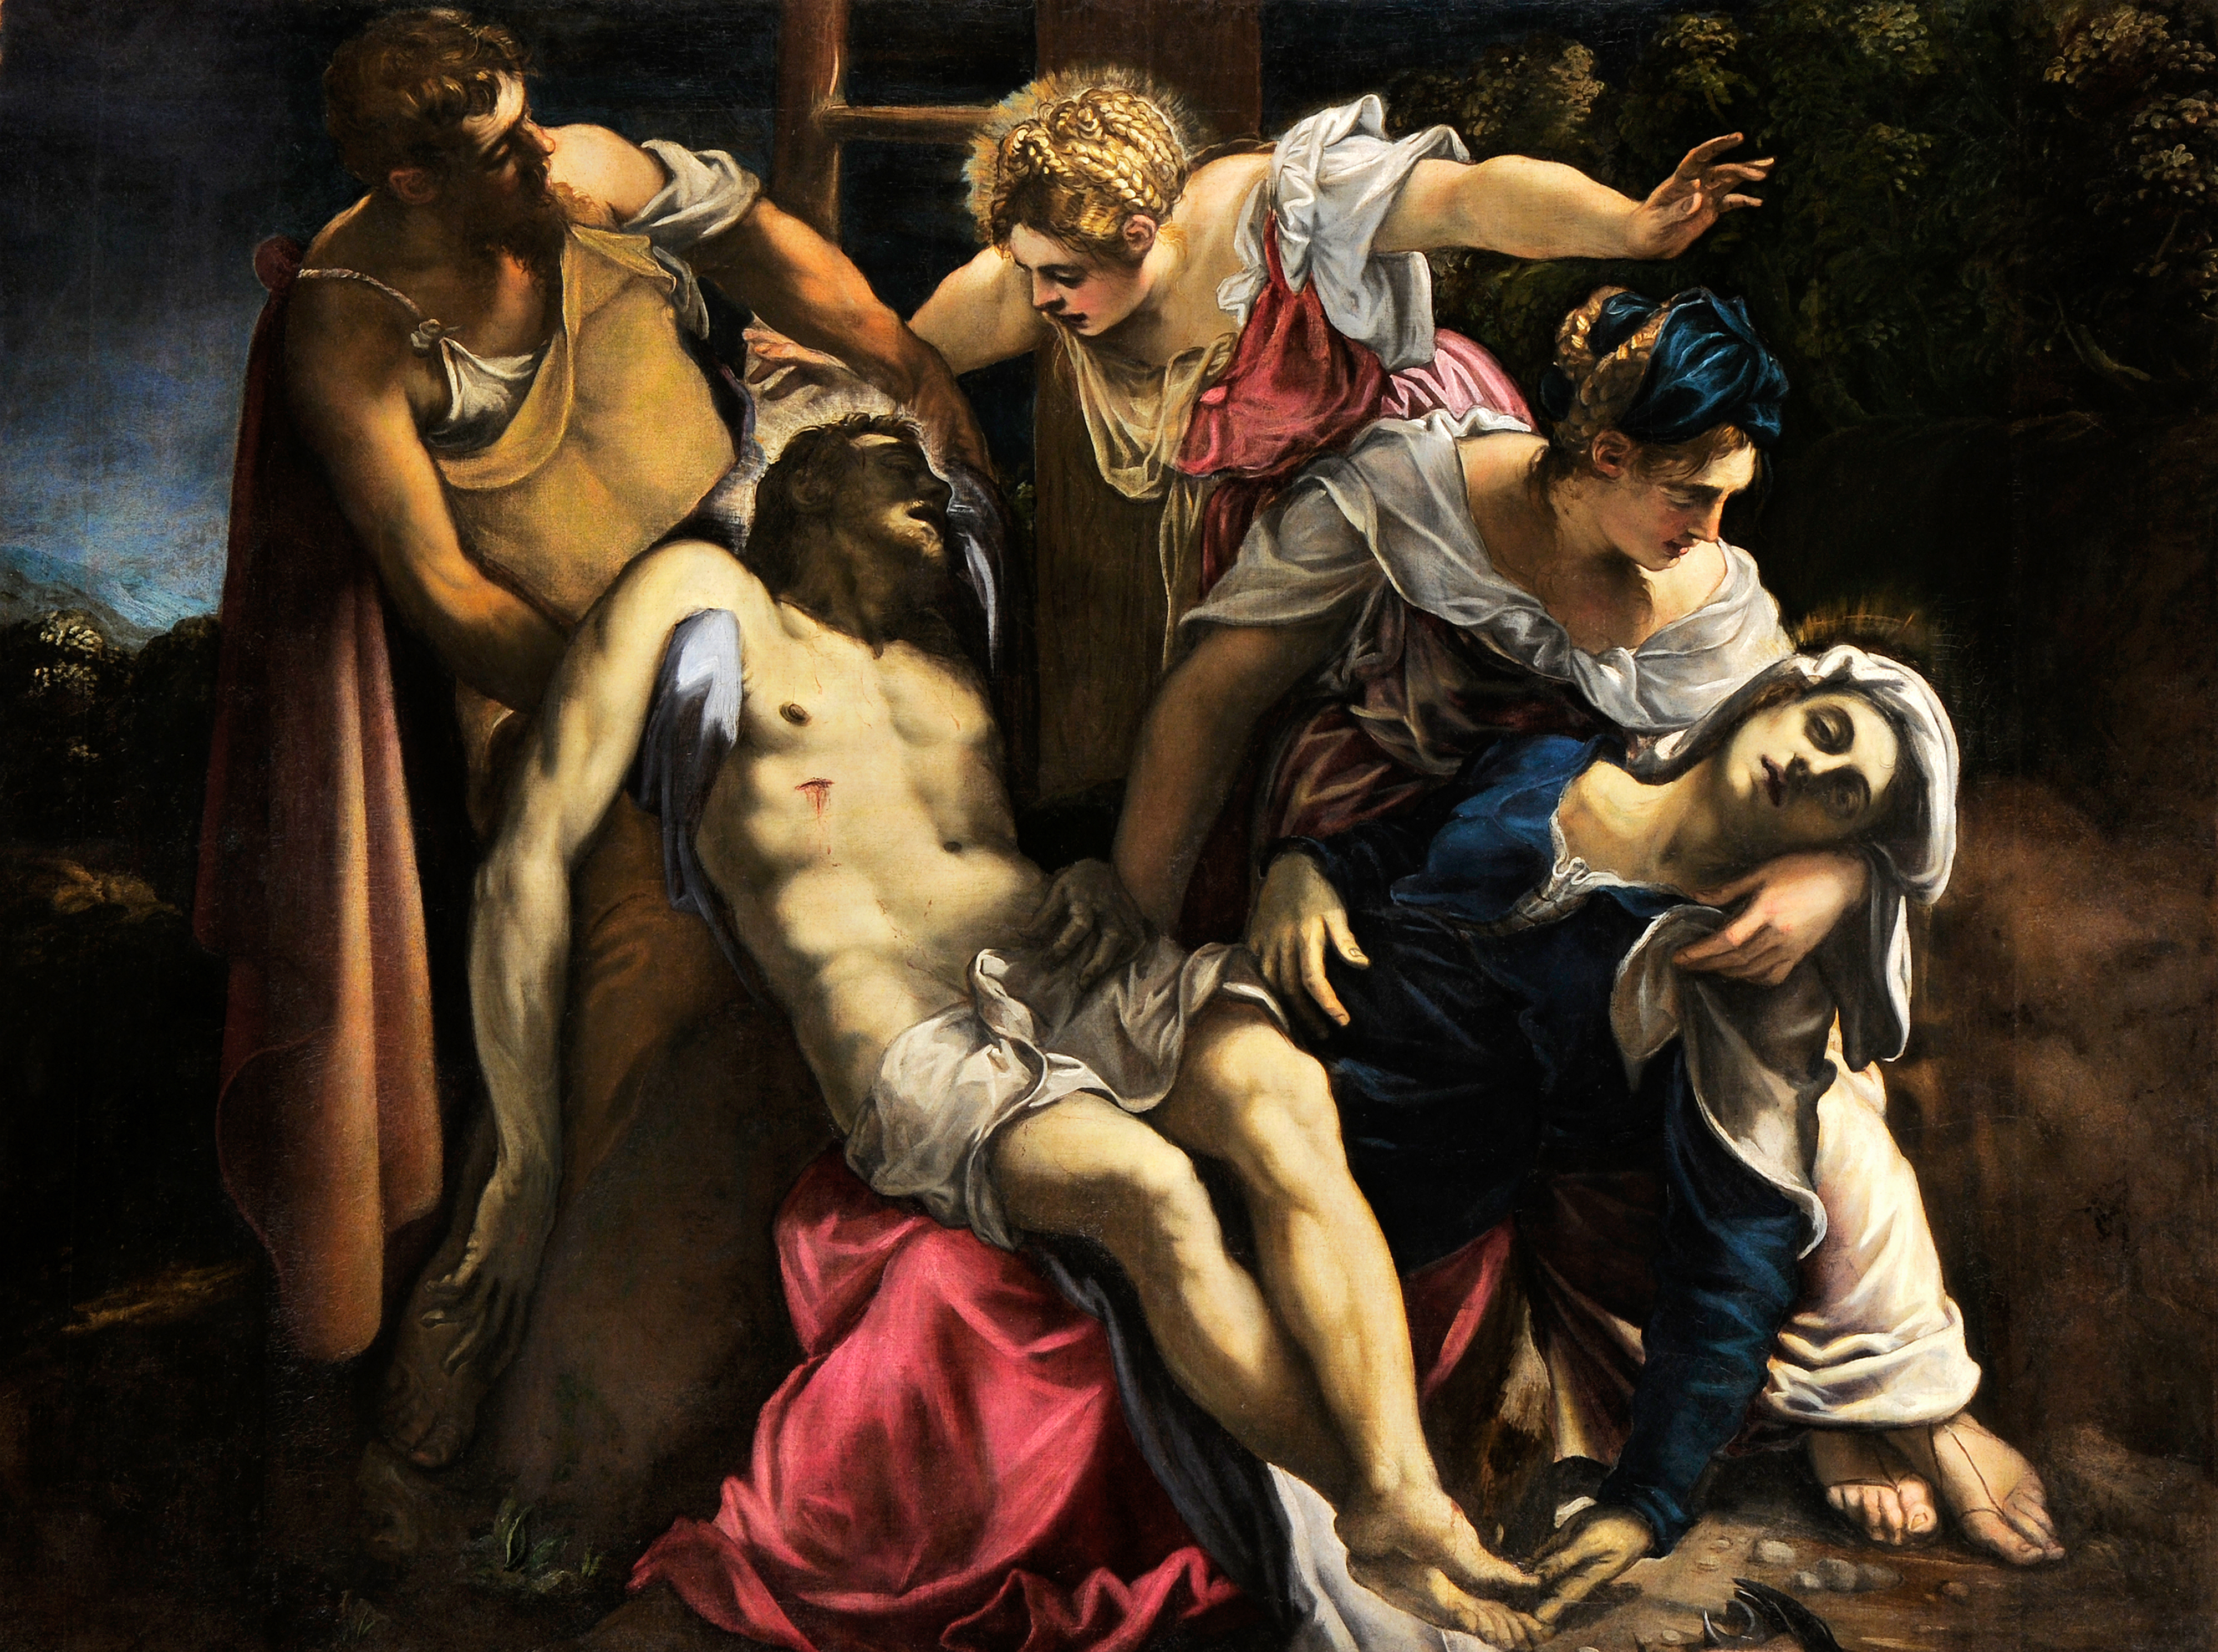 For His 500th Birthday Renaissance Master Jacopo Tintoretto